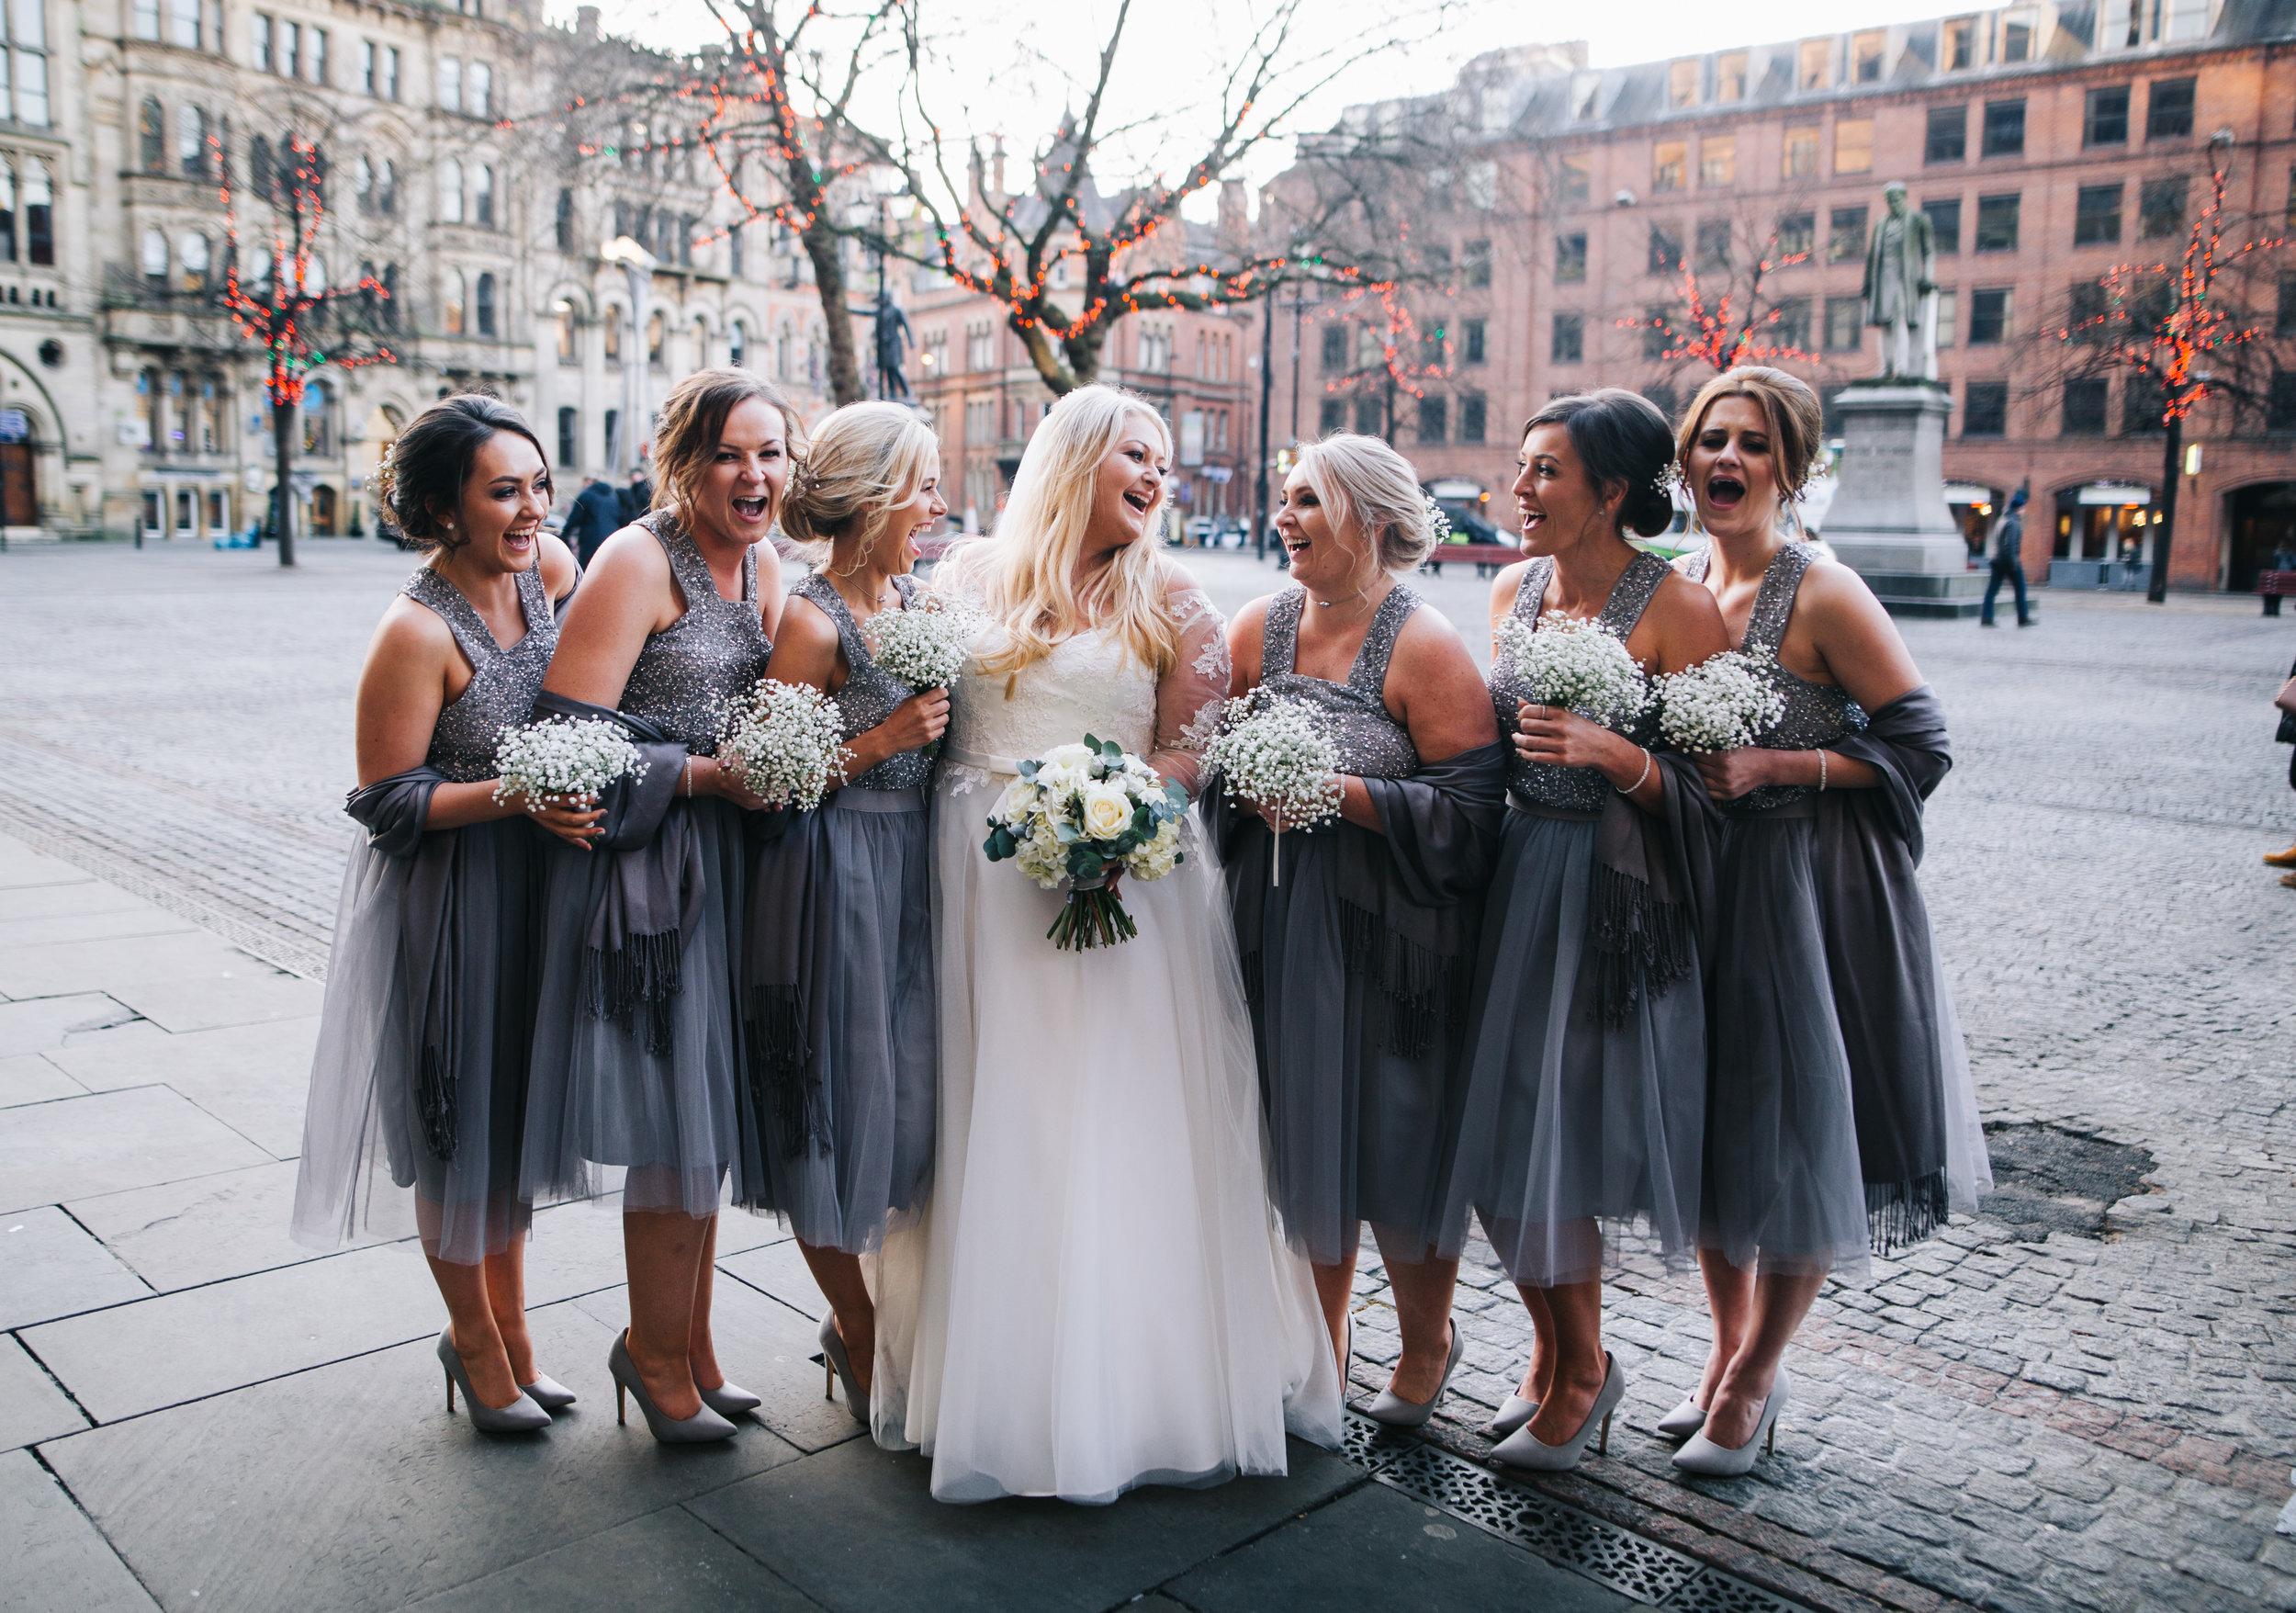 winter wedding Manchester - bride and bridesmaid